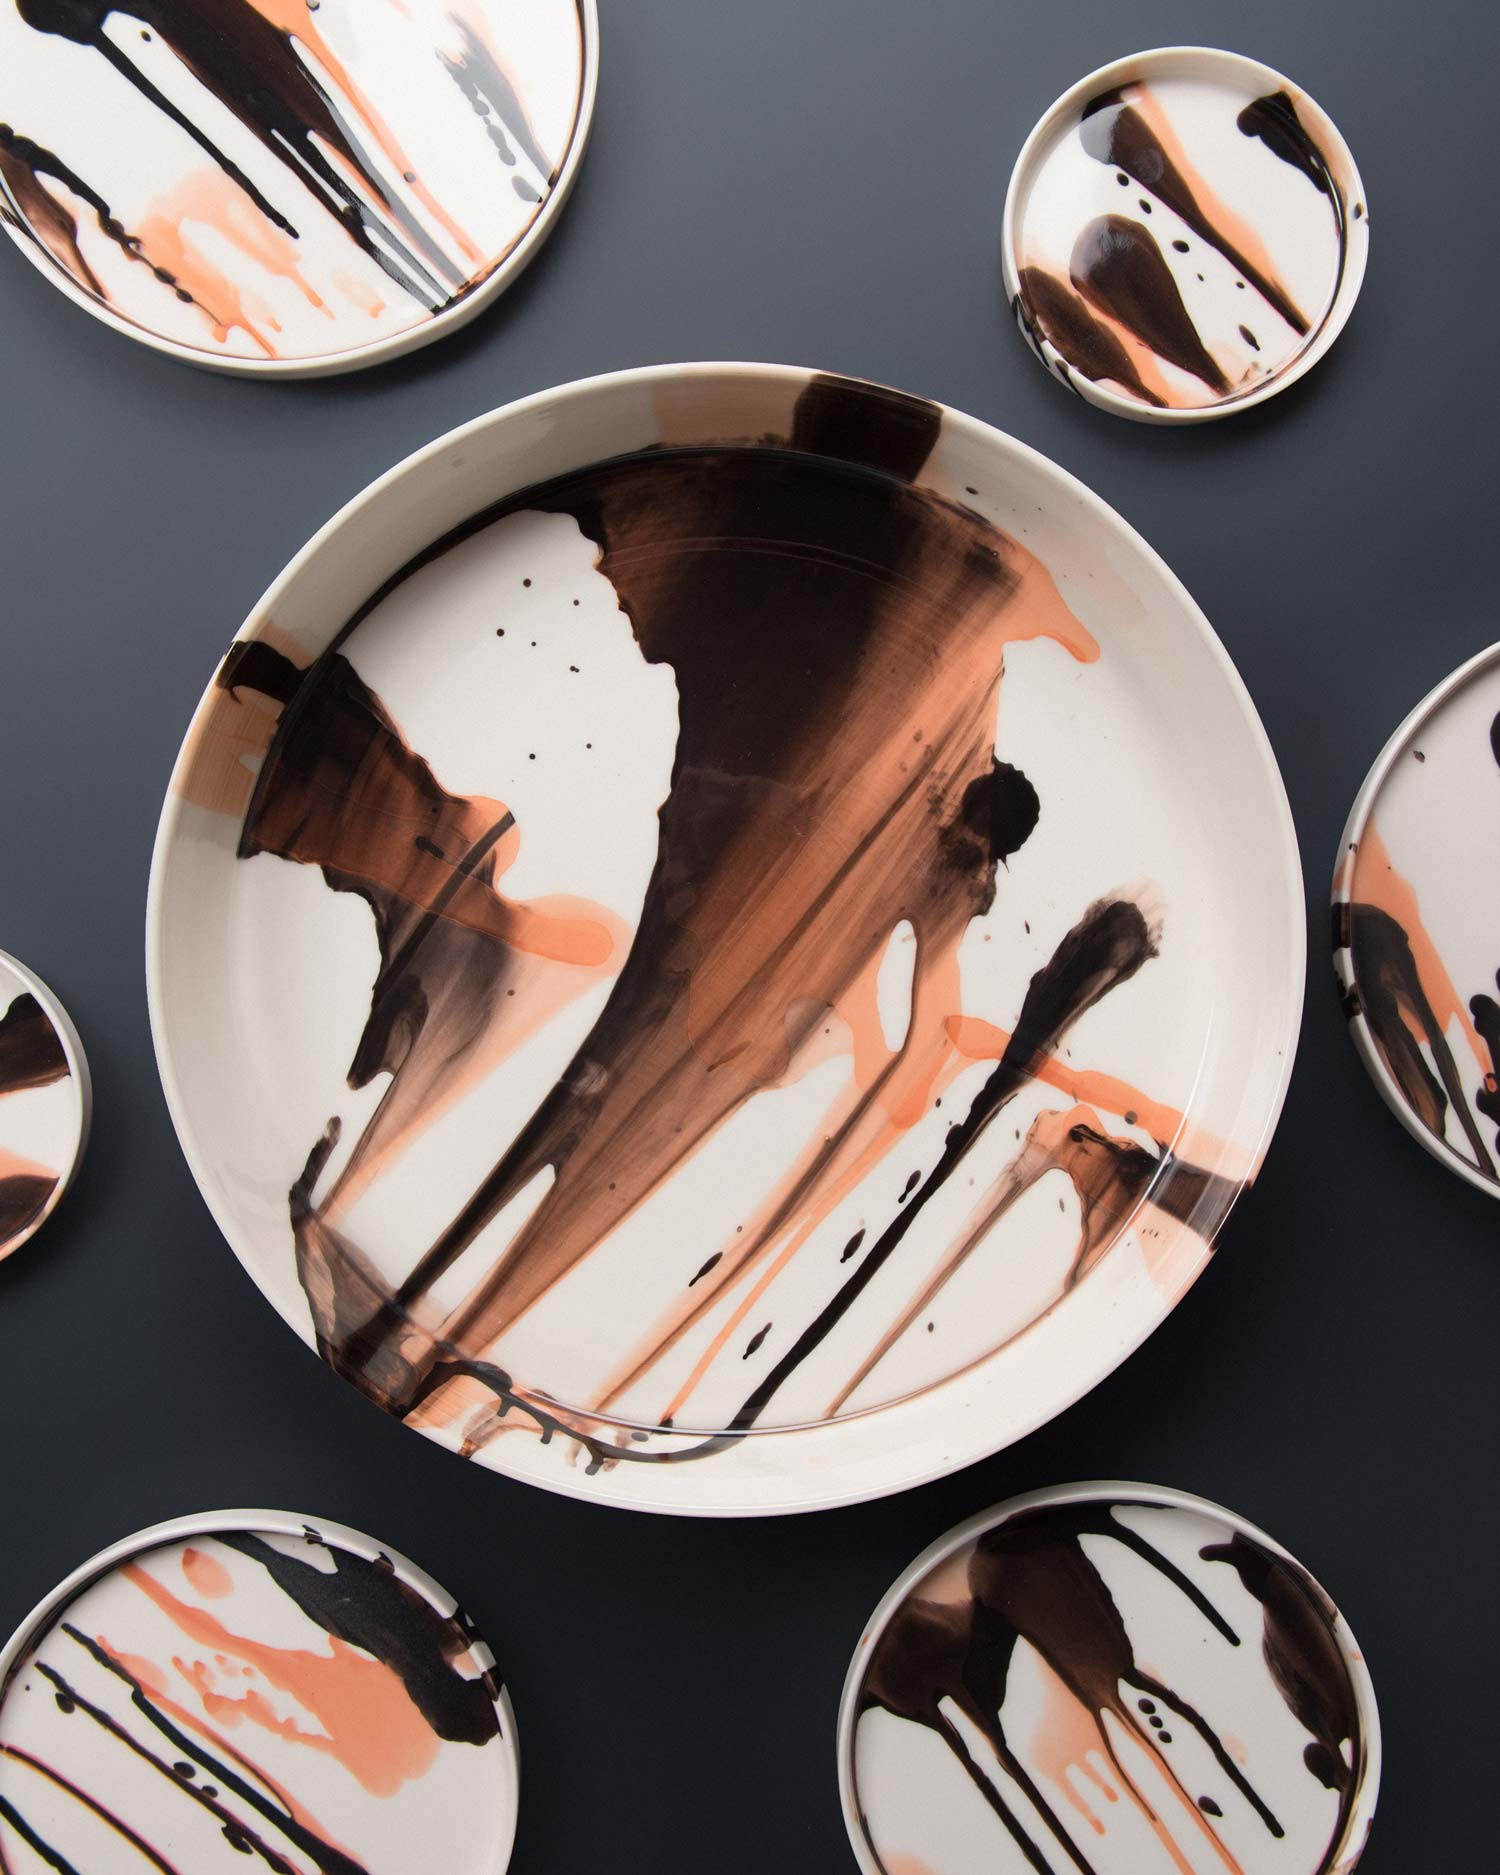 kerfuffle-plates-2.jpg